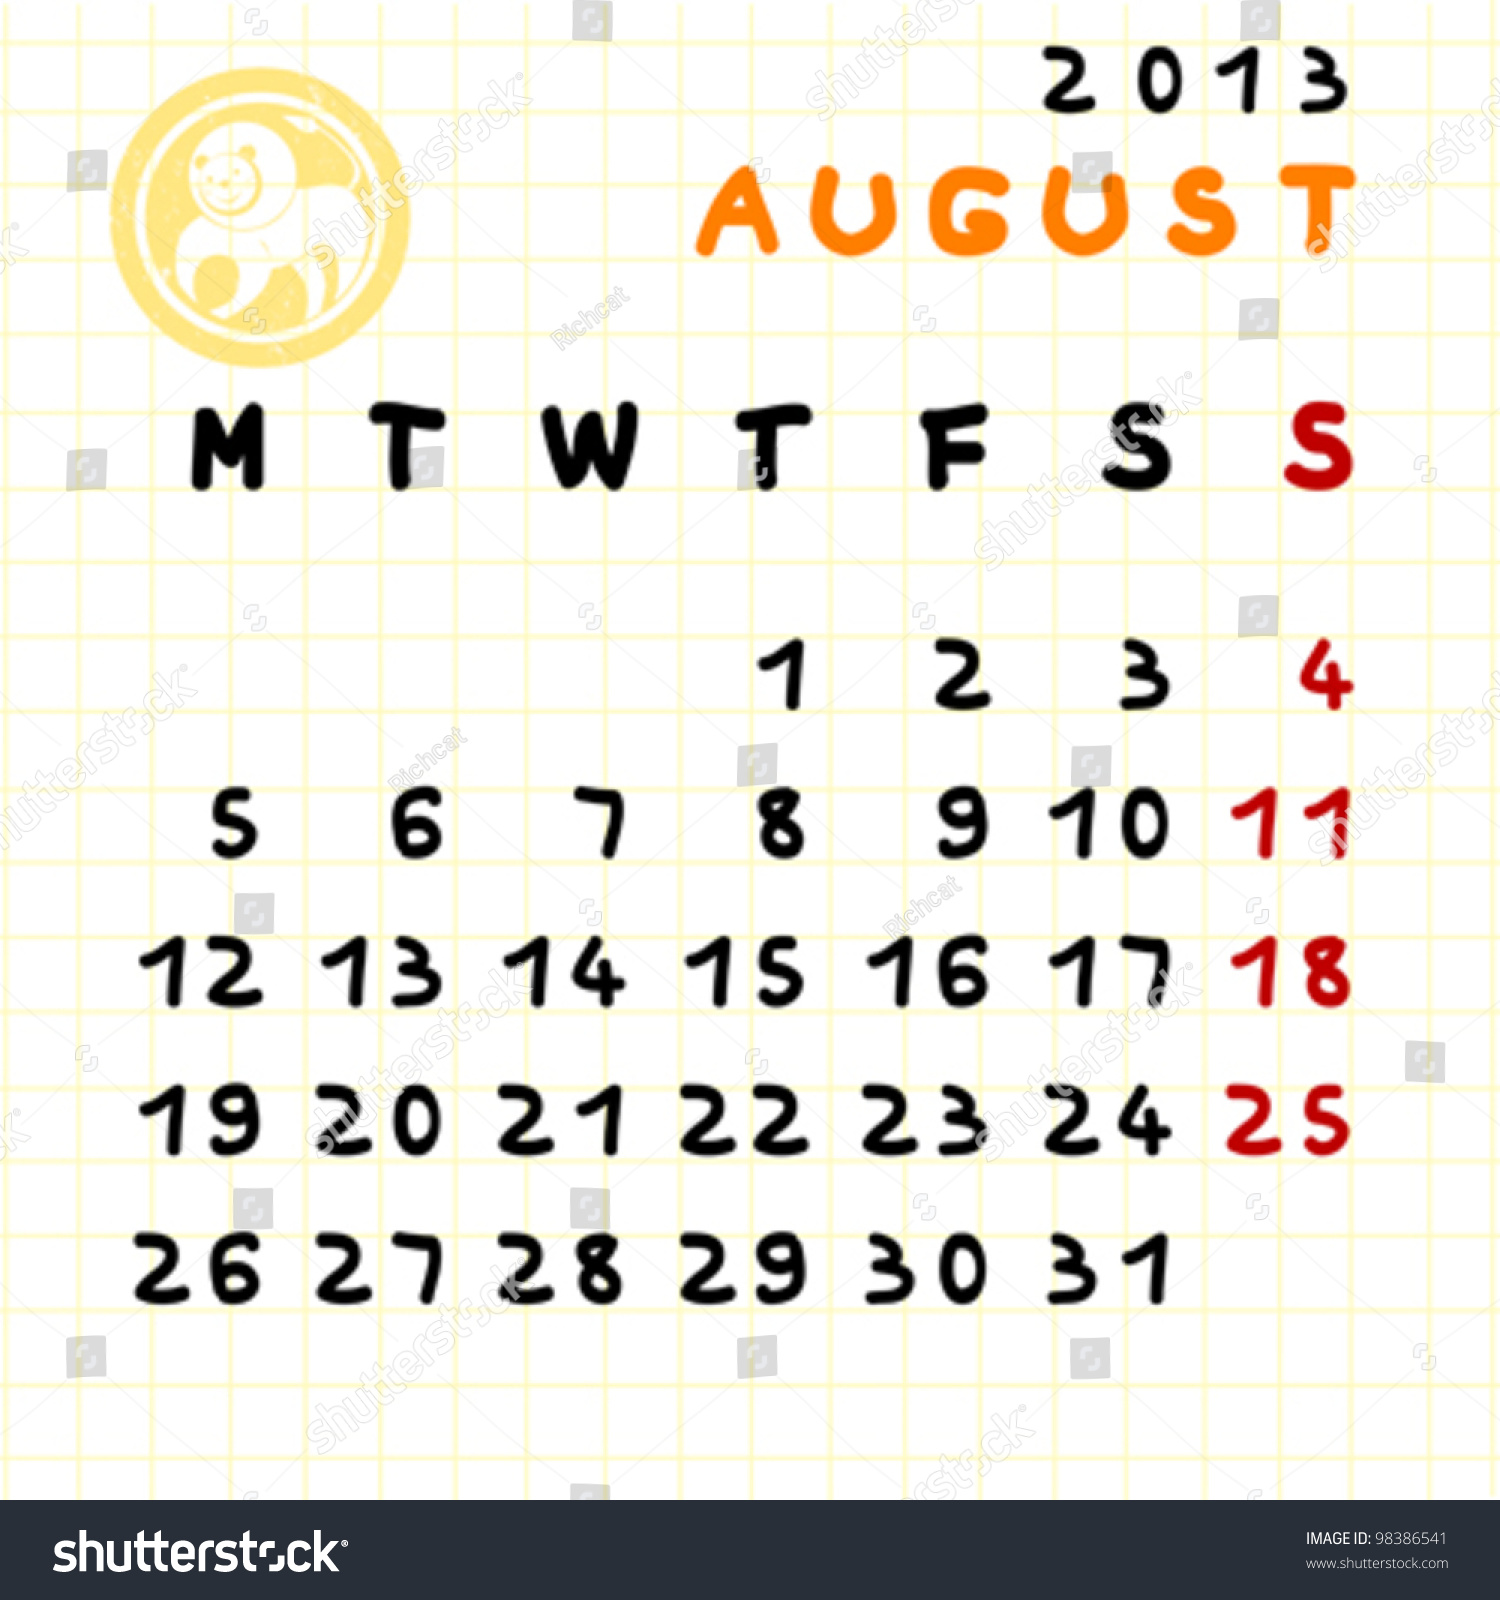 Monthly Calendar Zodiac Signs : Monthly calendar august leo zodiac stock vector